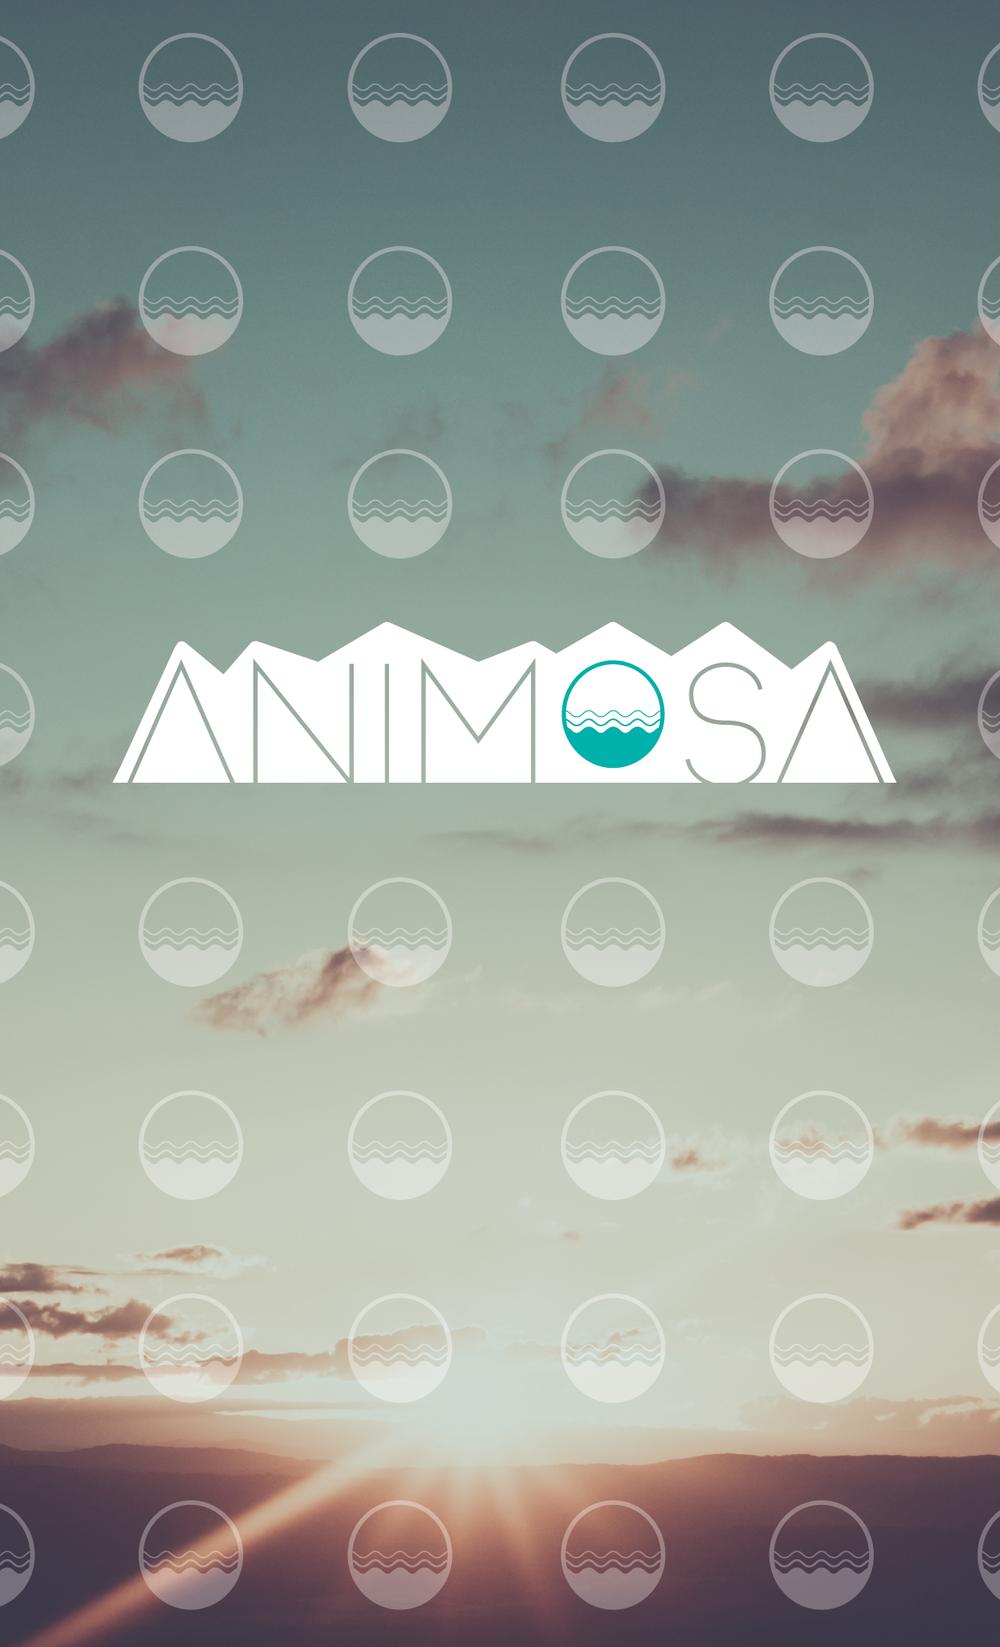 ANIMOSA-01.png